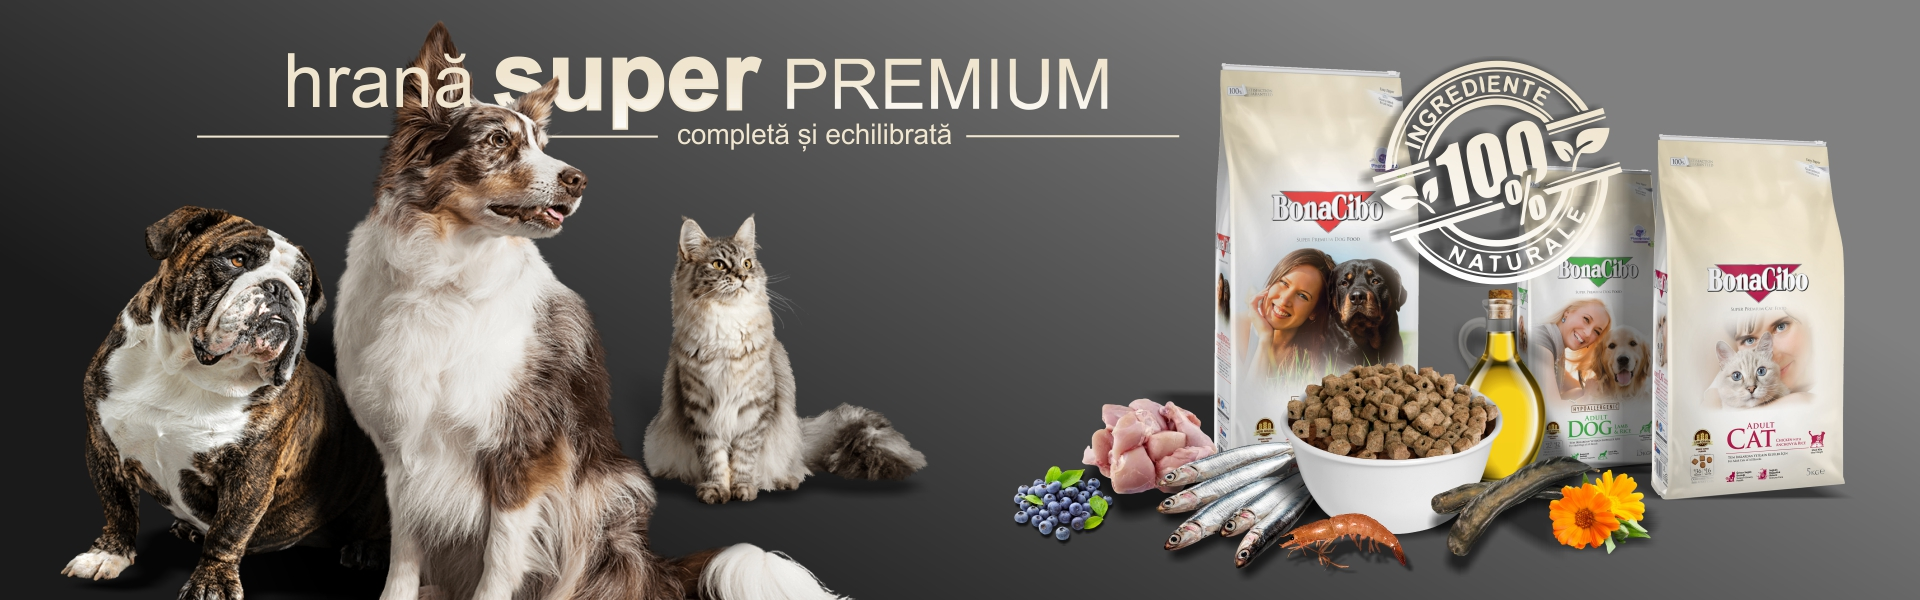 Bonacibo Hrana Super Premium Desktop